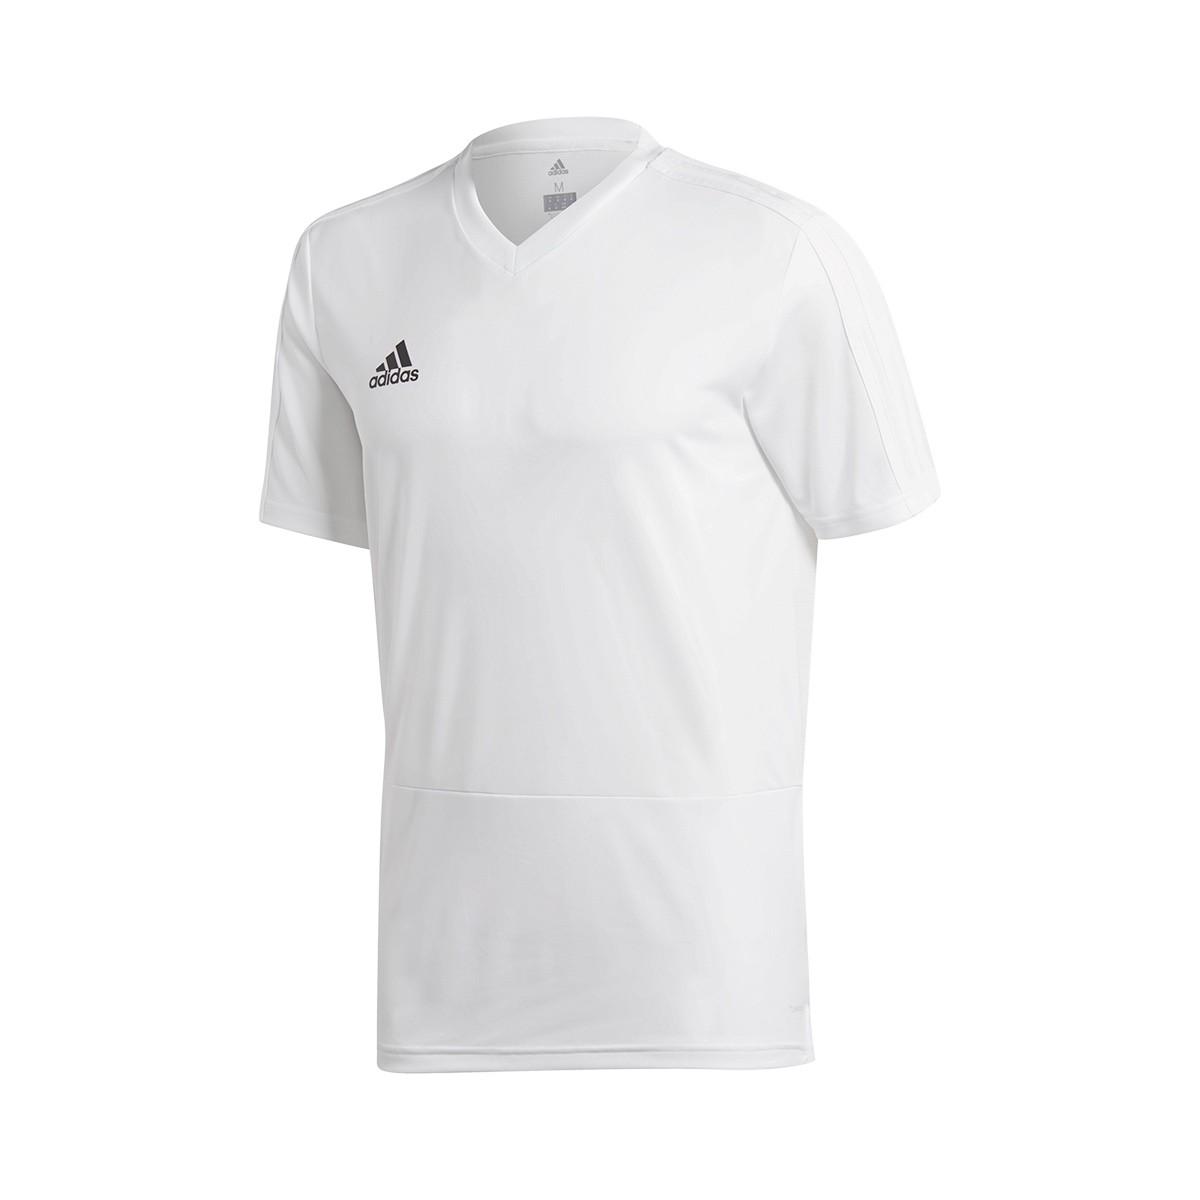 f644fa8ff05 Jersey adidas Condivo 18 Training m c White-Black - Football store ...